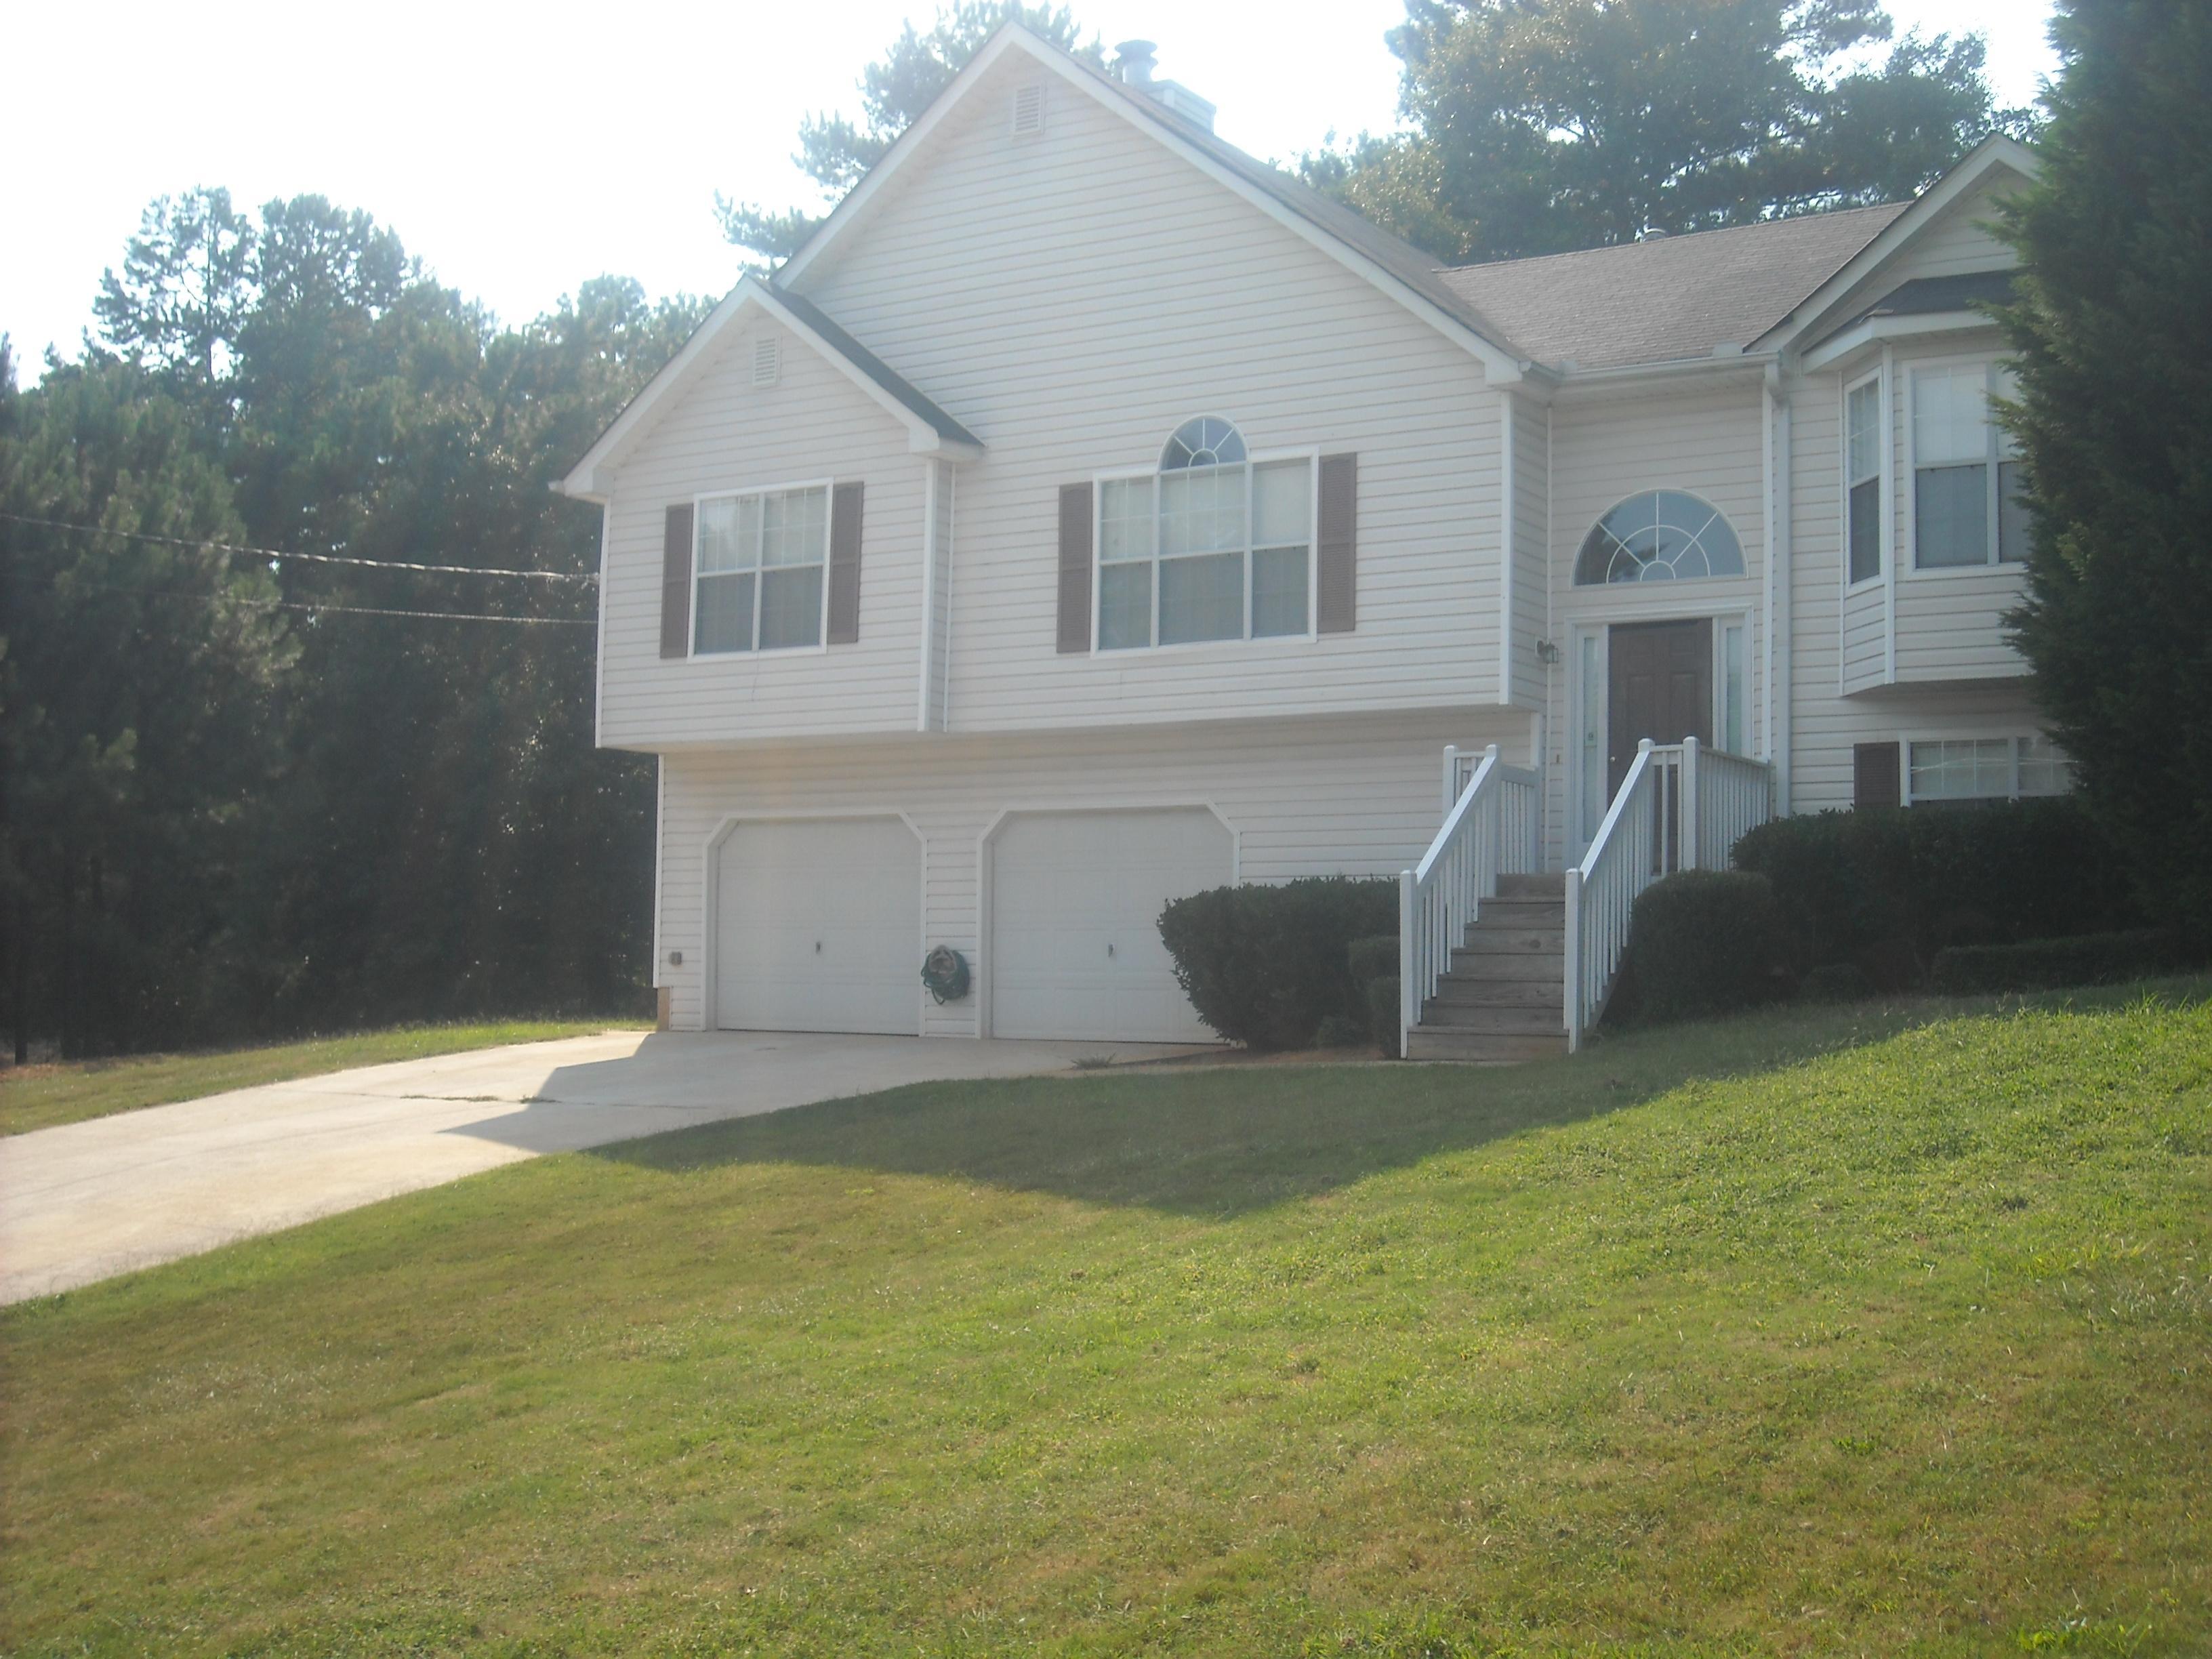 156 royal court dallas ga 30157 foreclosed home